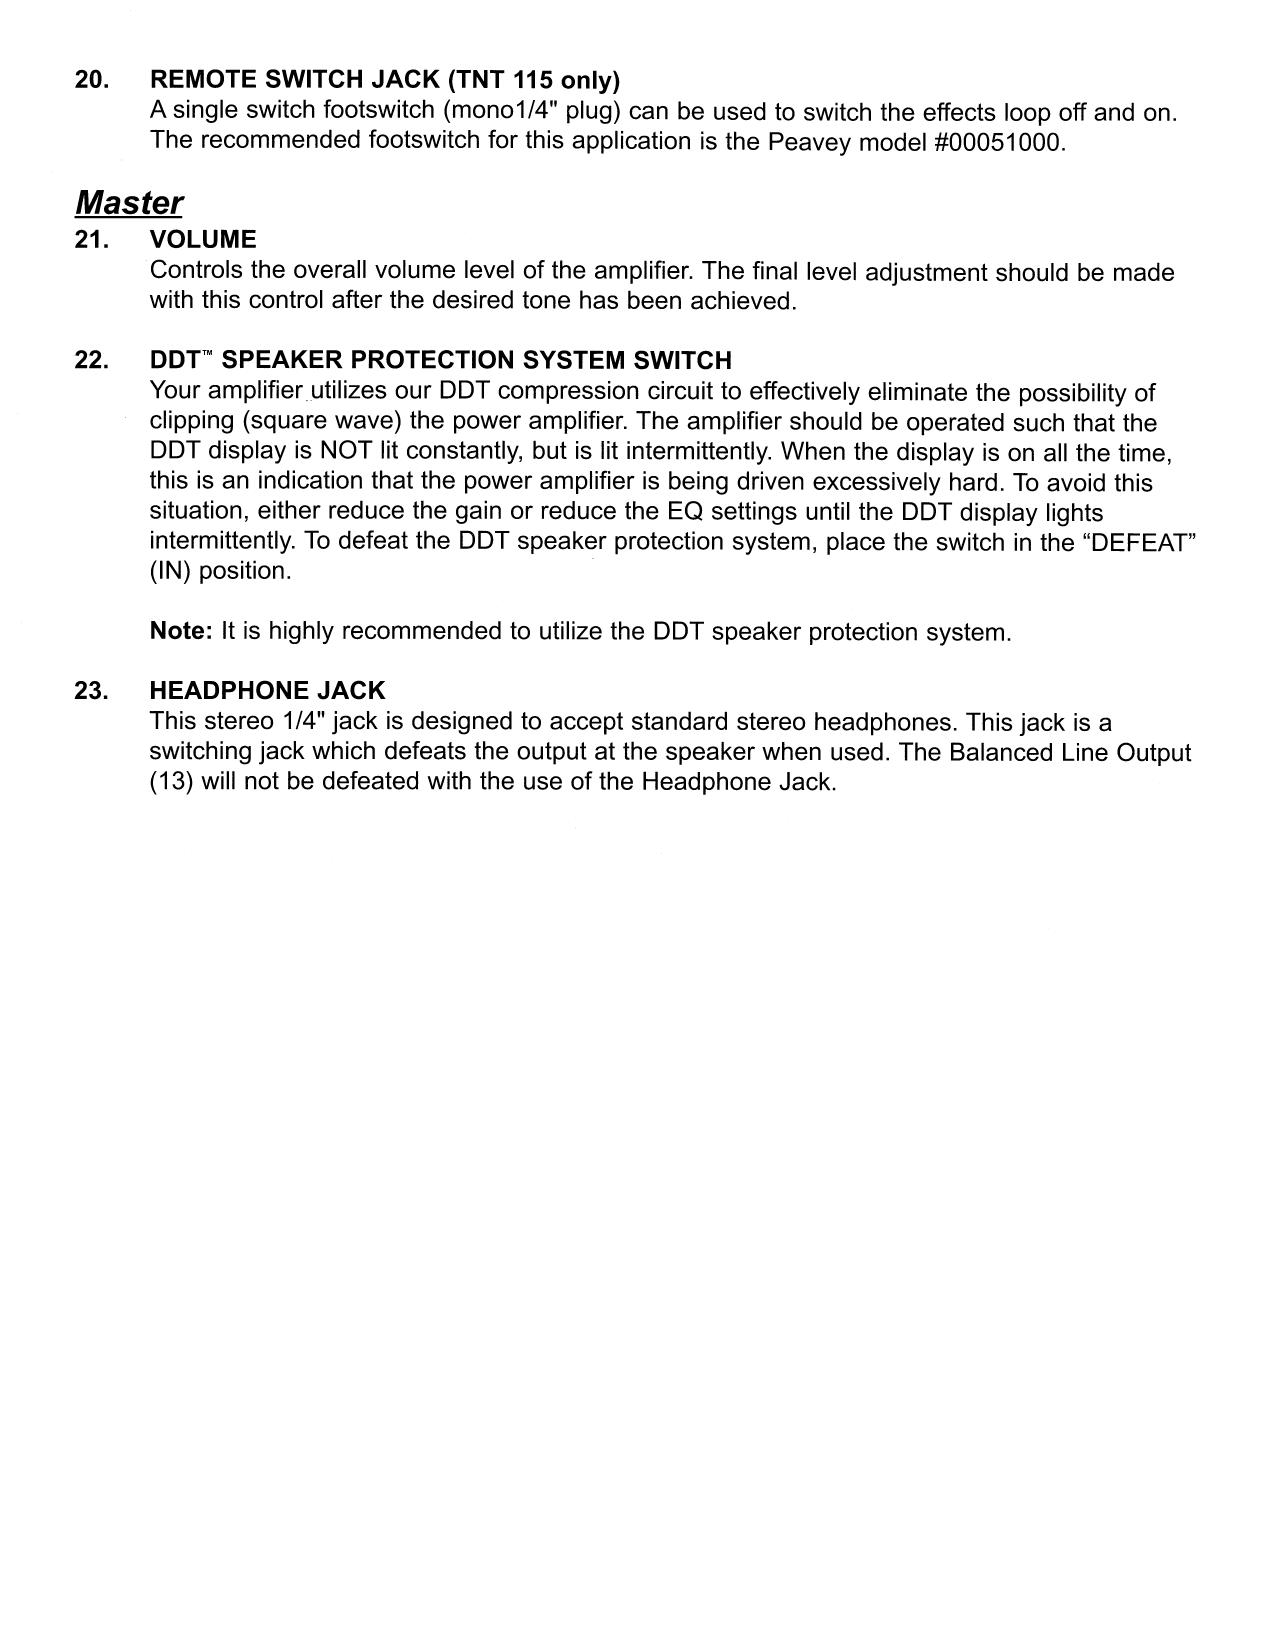 PDF manual for Peavey Amp TNT 115S